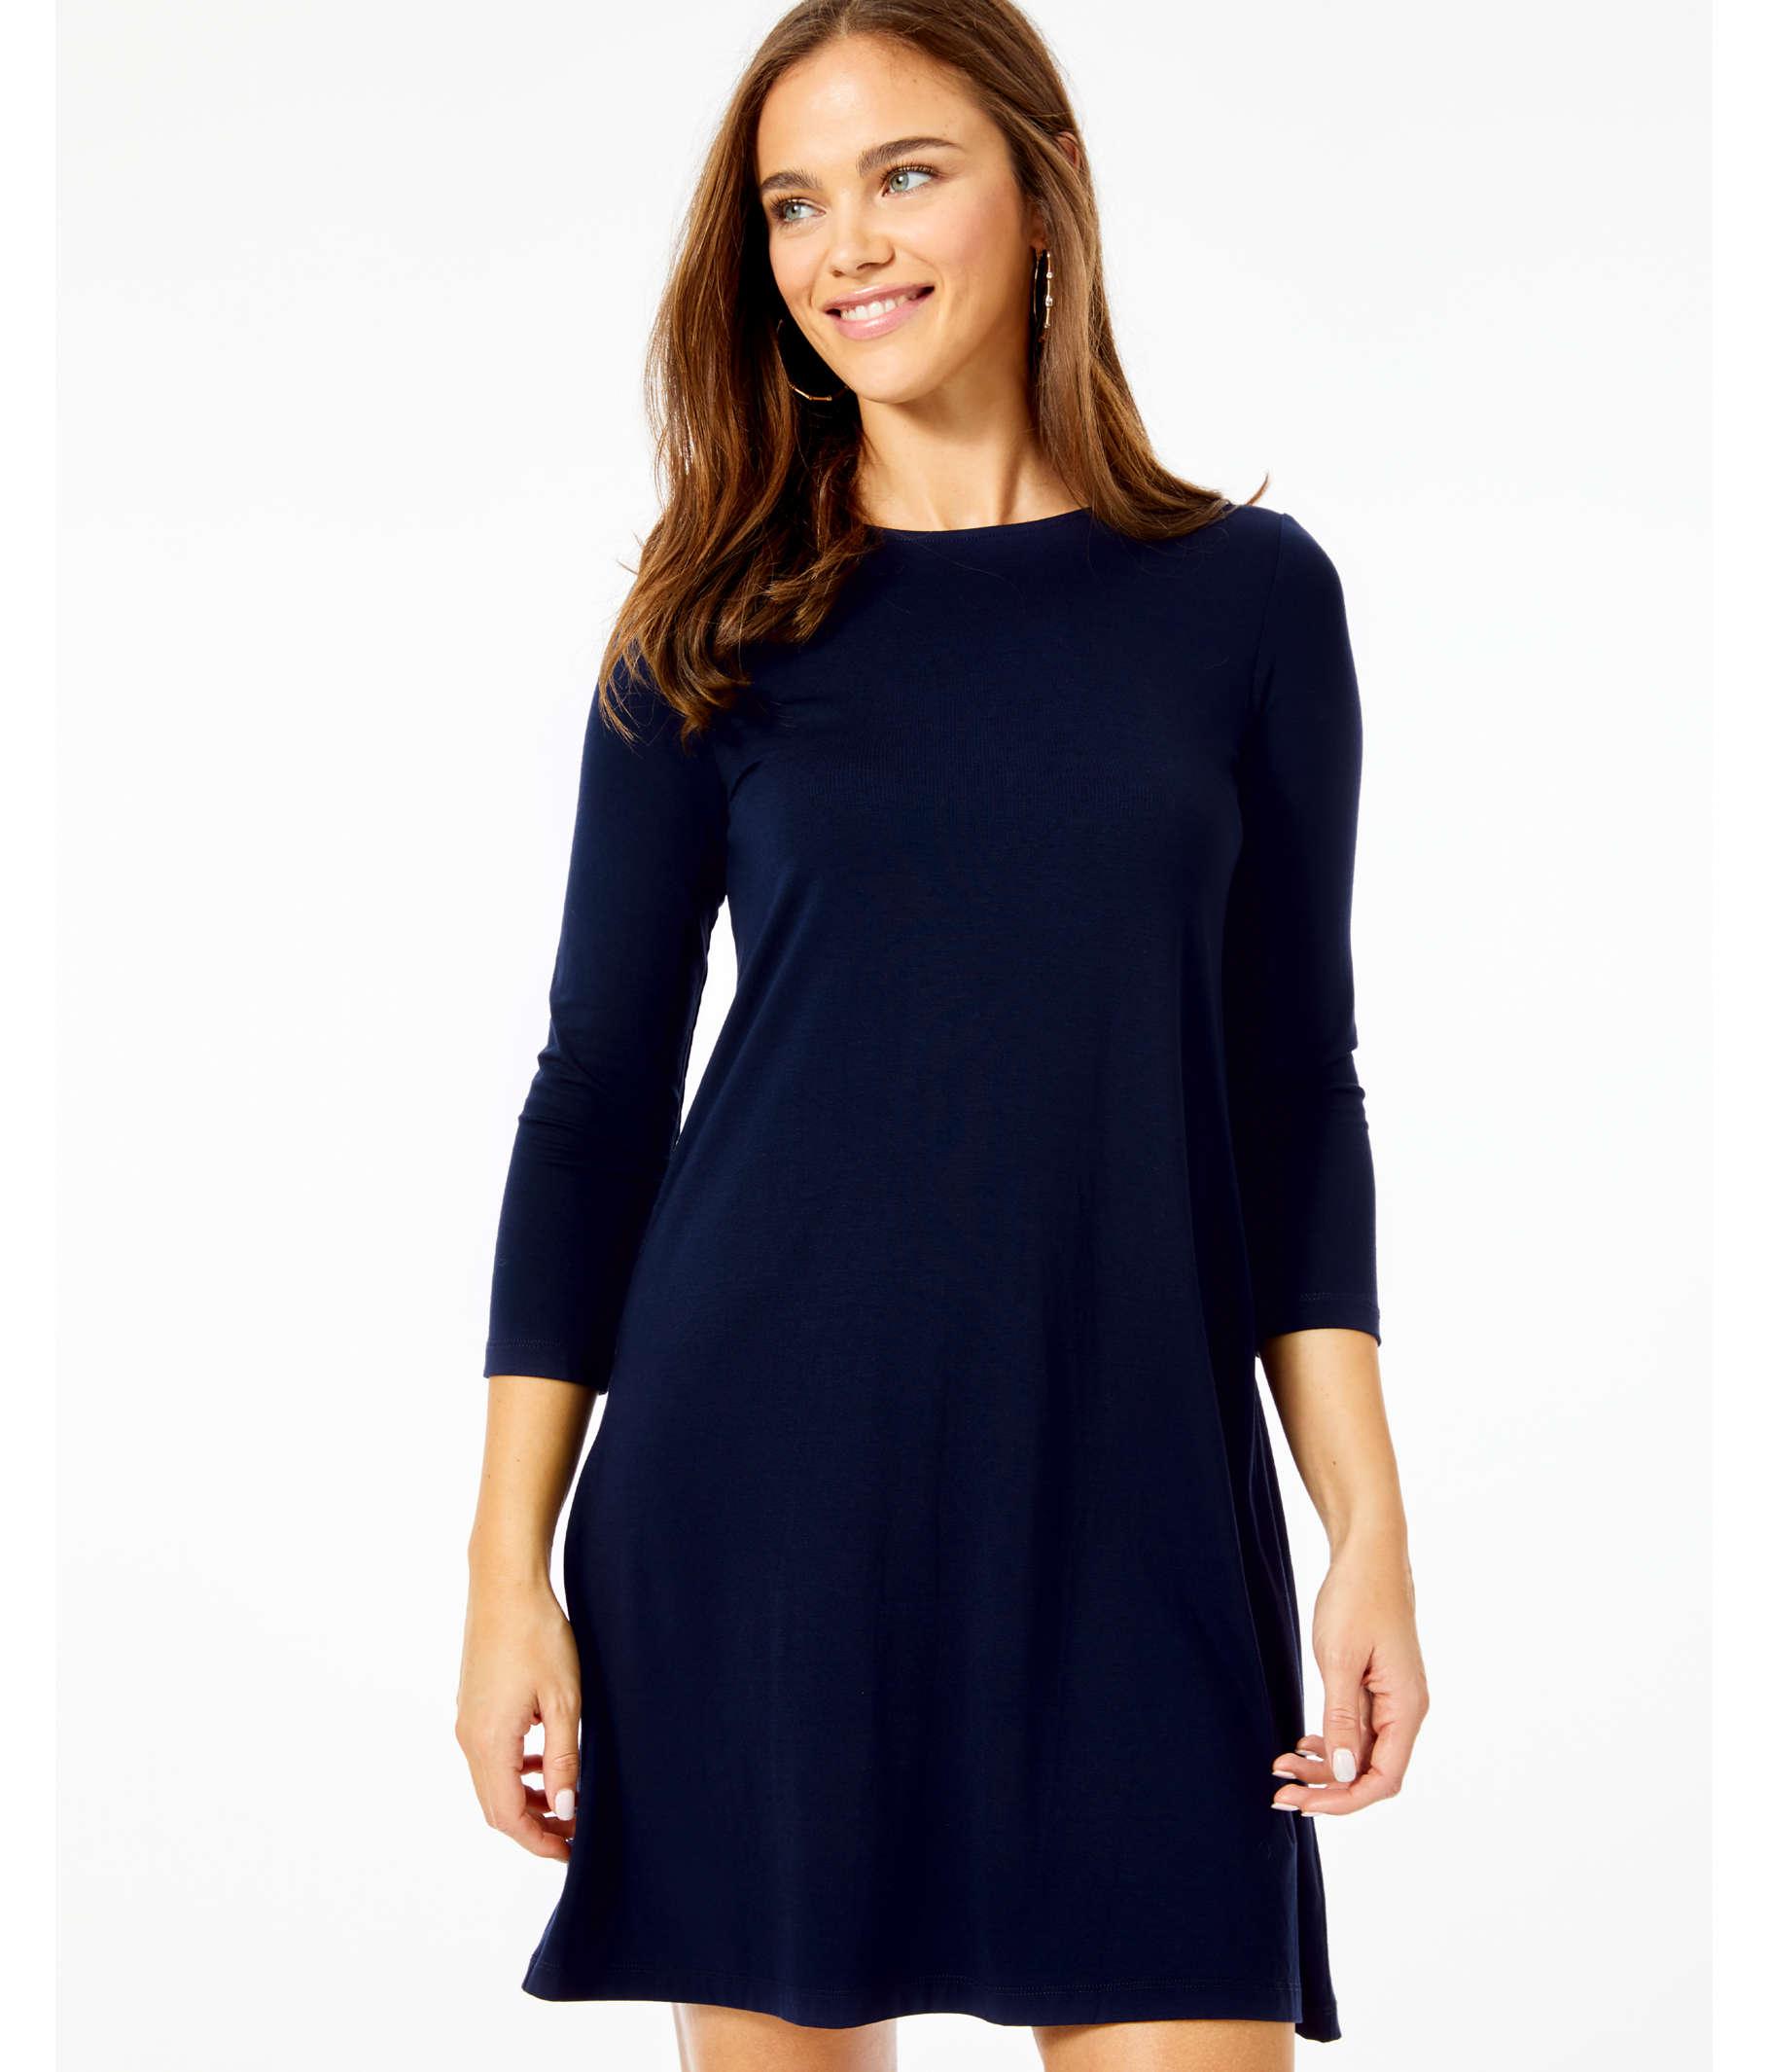 b3d118a98b3f3e ... Ophelia Swing Dress, Midnight Navy, large ...